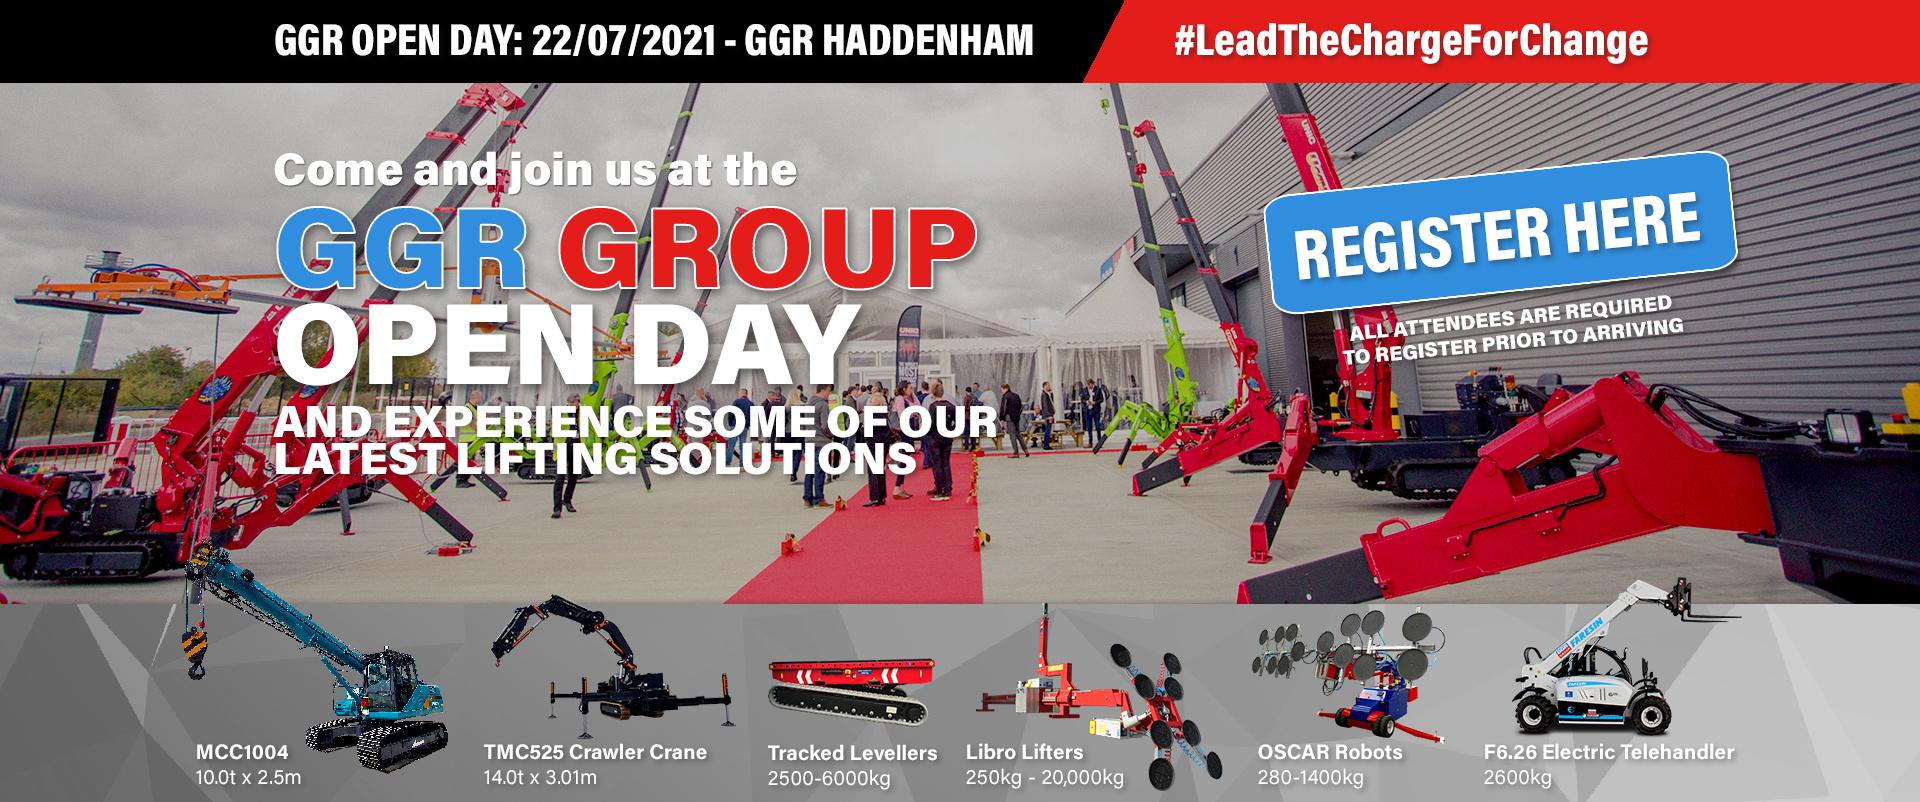 https://electrictelehandler.co.uk/wp-content/uploads/2021/06/GGR-Group-Open-Day-Header-homepage-1.jpg